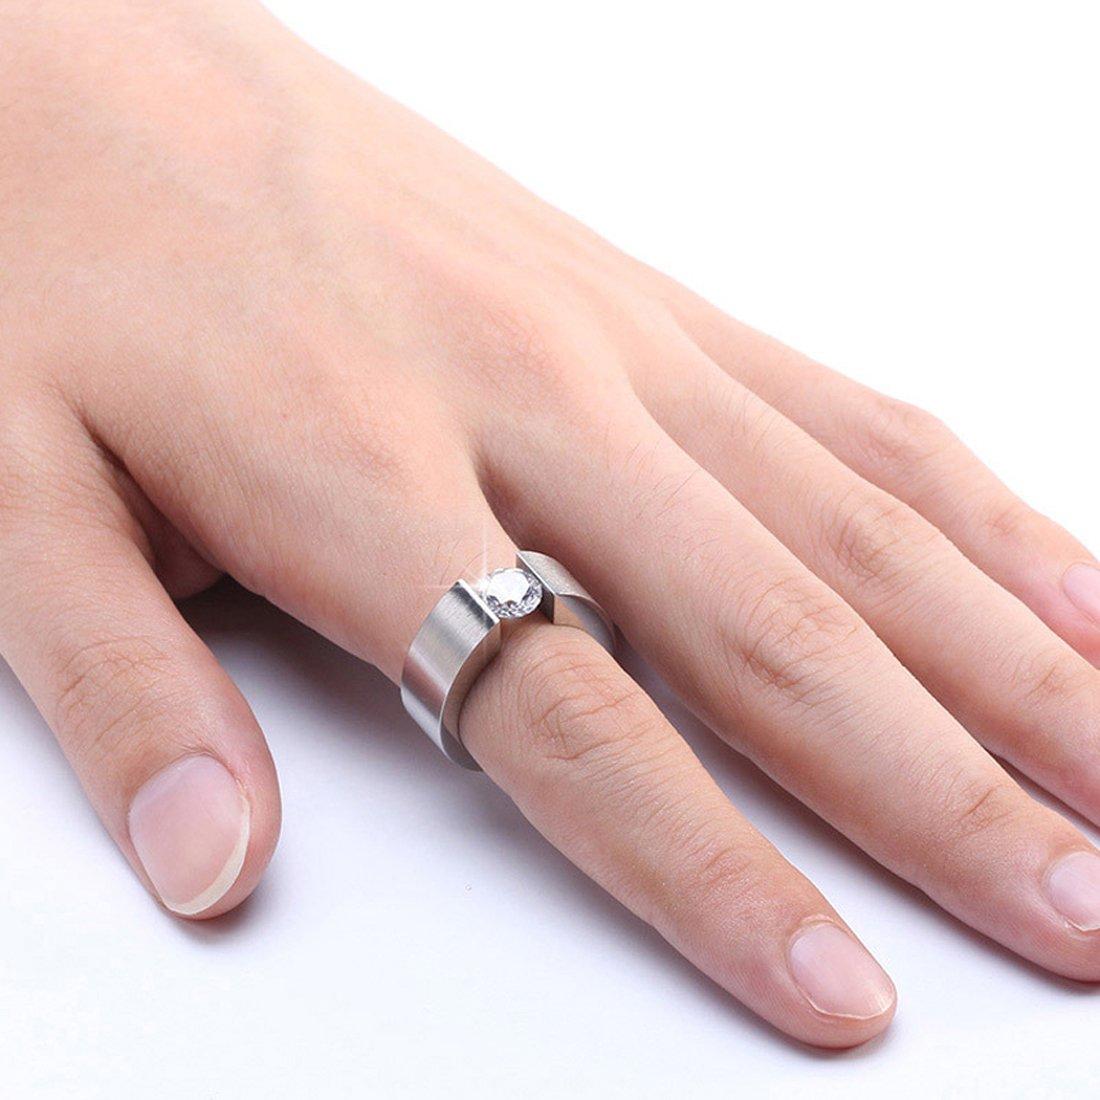 JAYEJA AAA+ Zircon Ring Titanium Steel Men Women Ring for Engagement ...